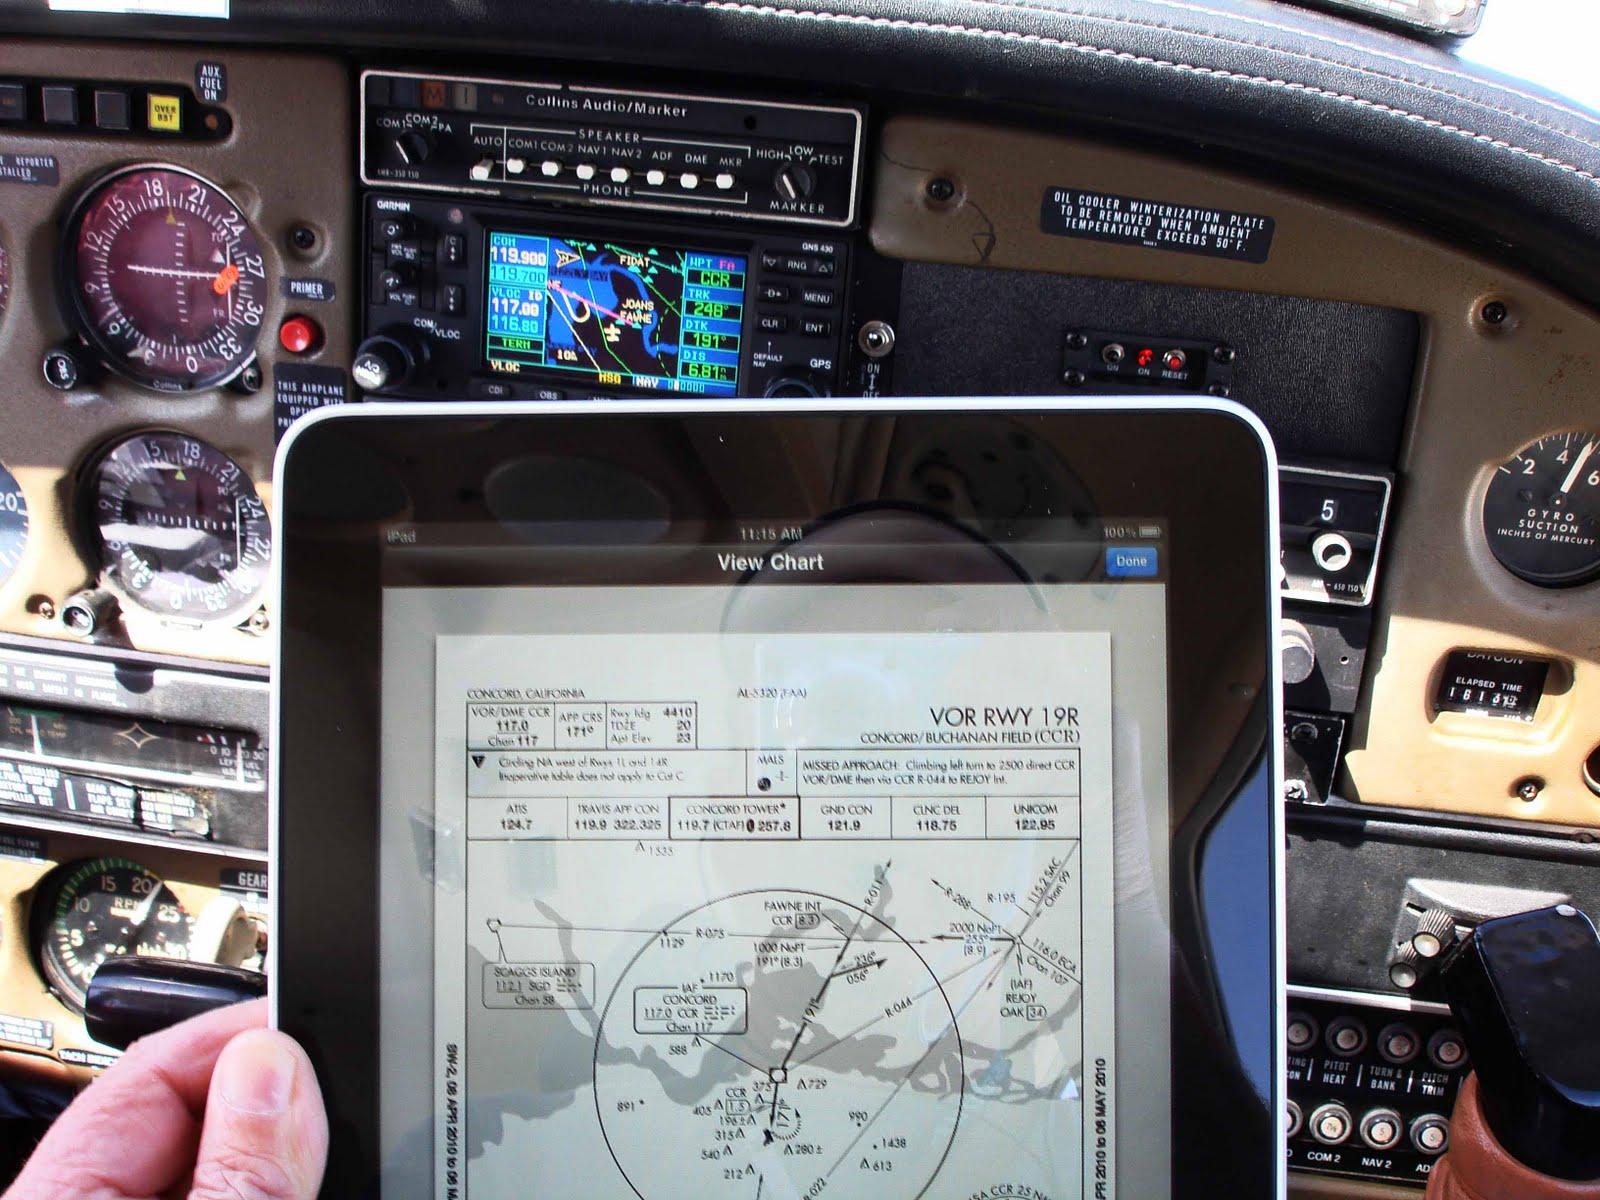 Electronic Flight Bag (EFB)